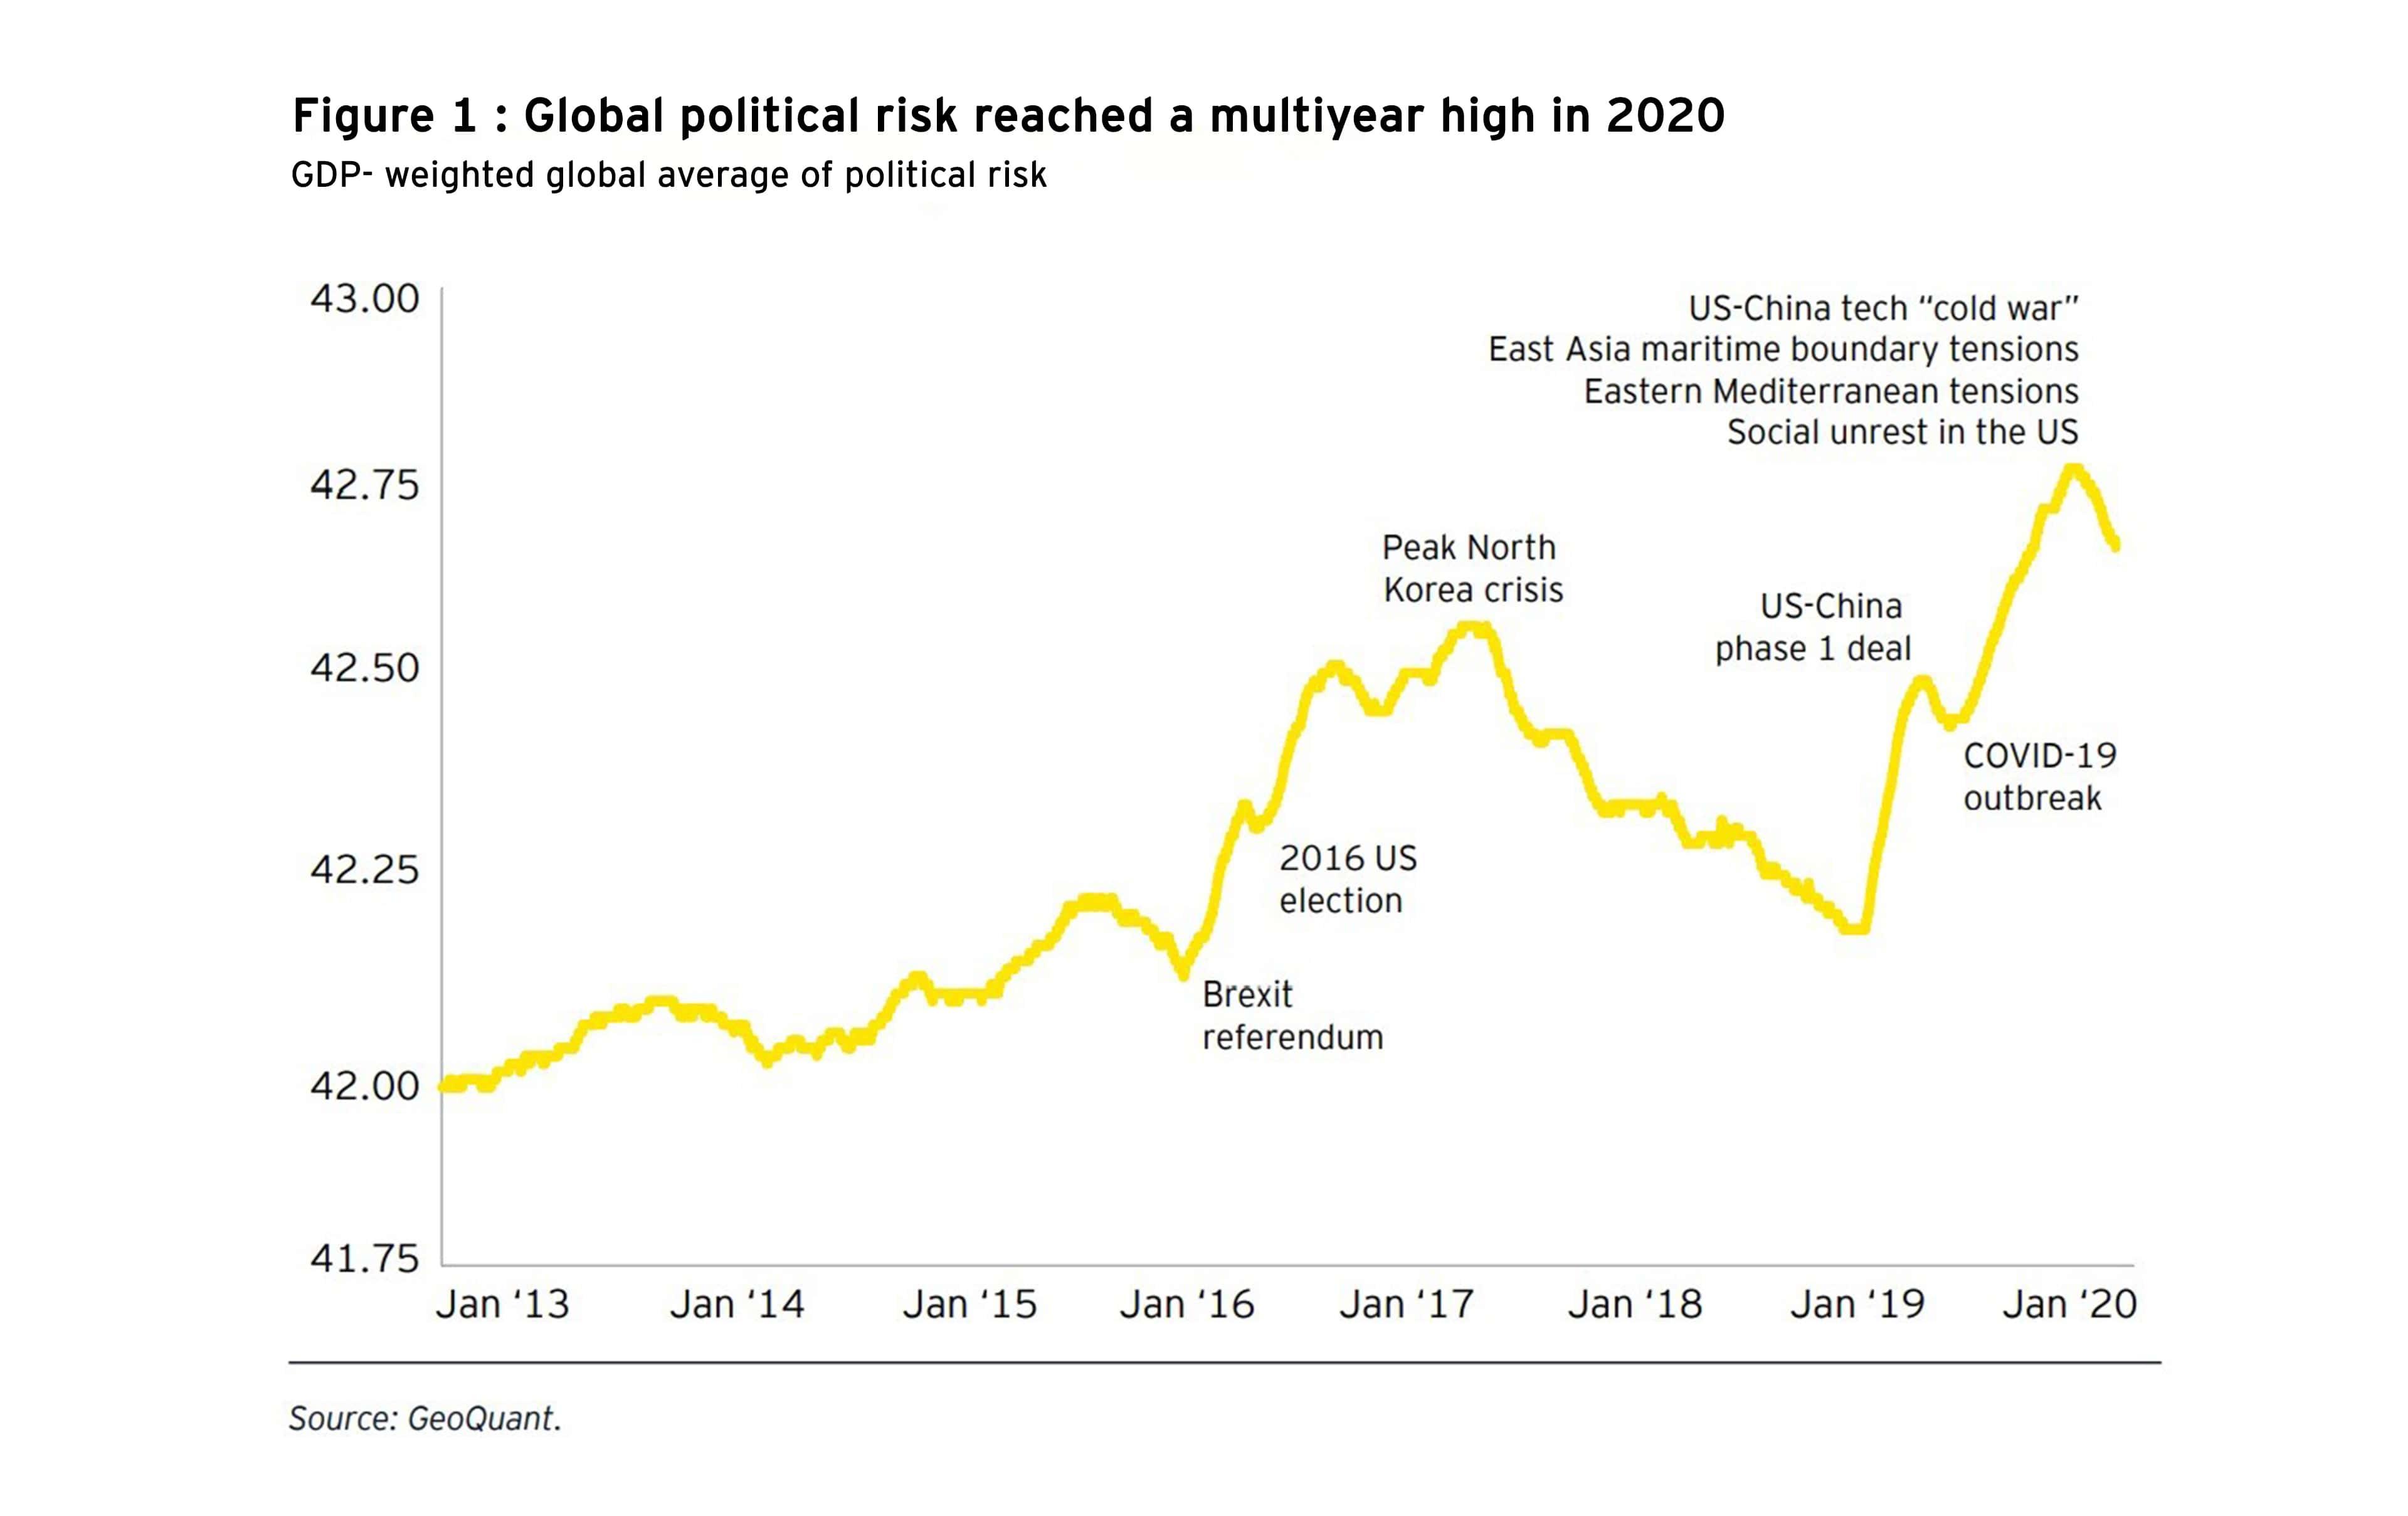 Global political risk reached a multiyear high in 2020